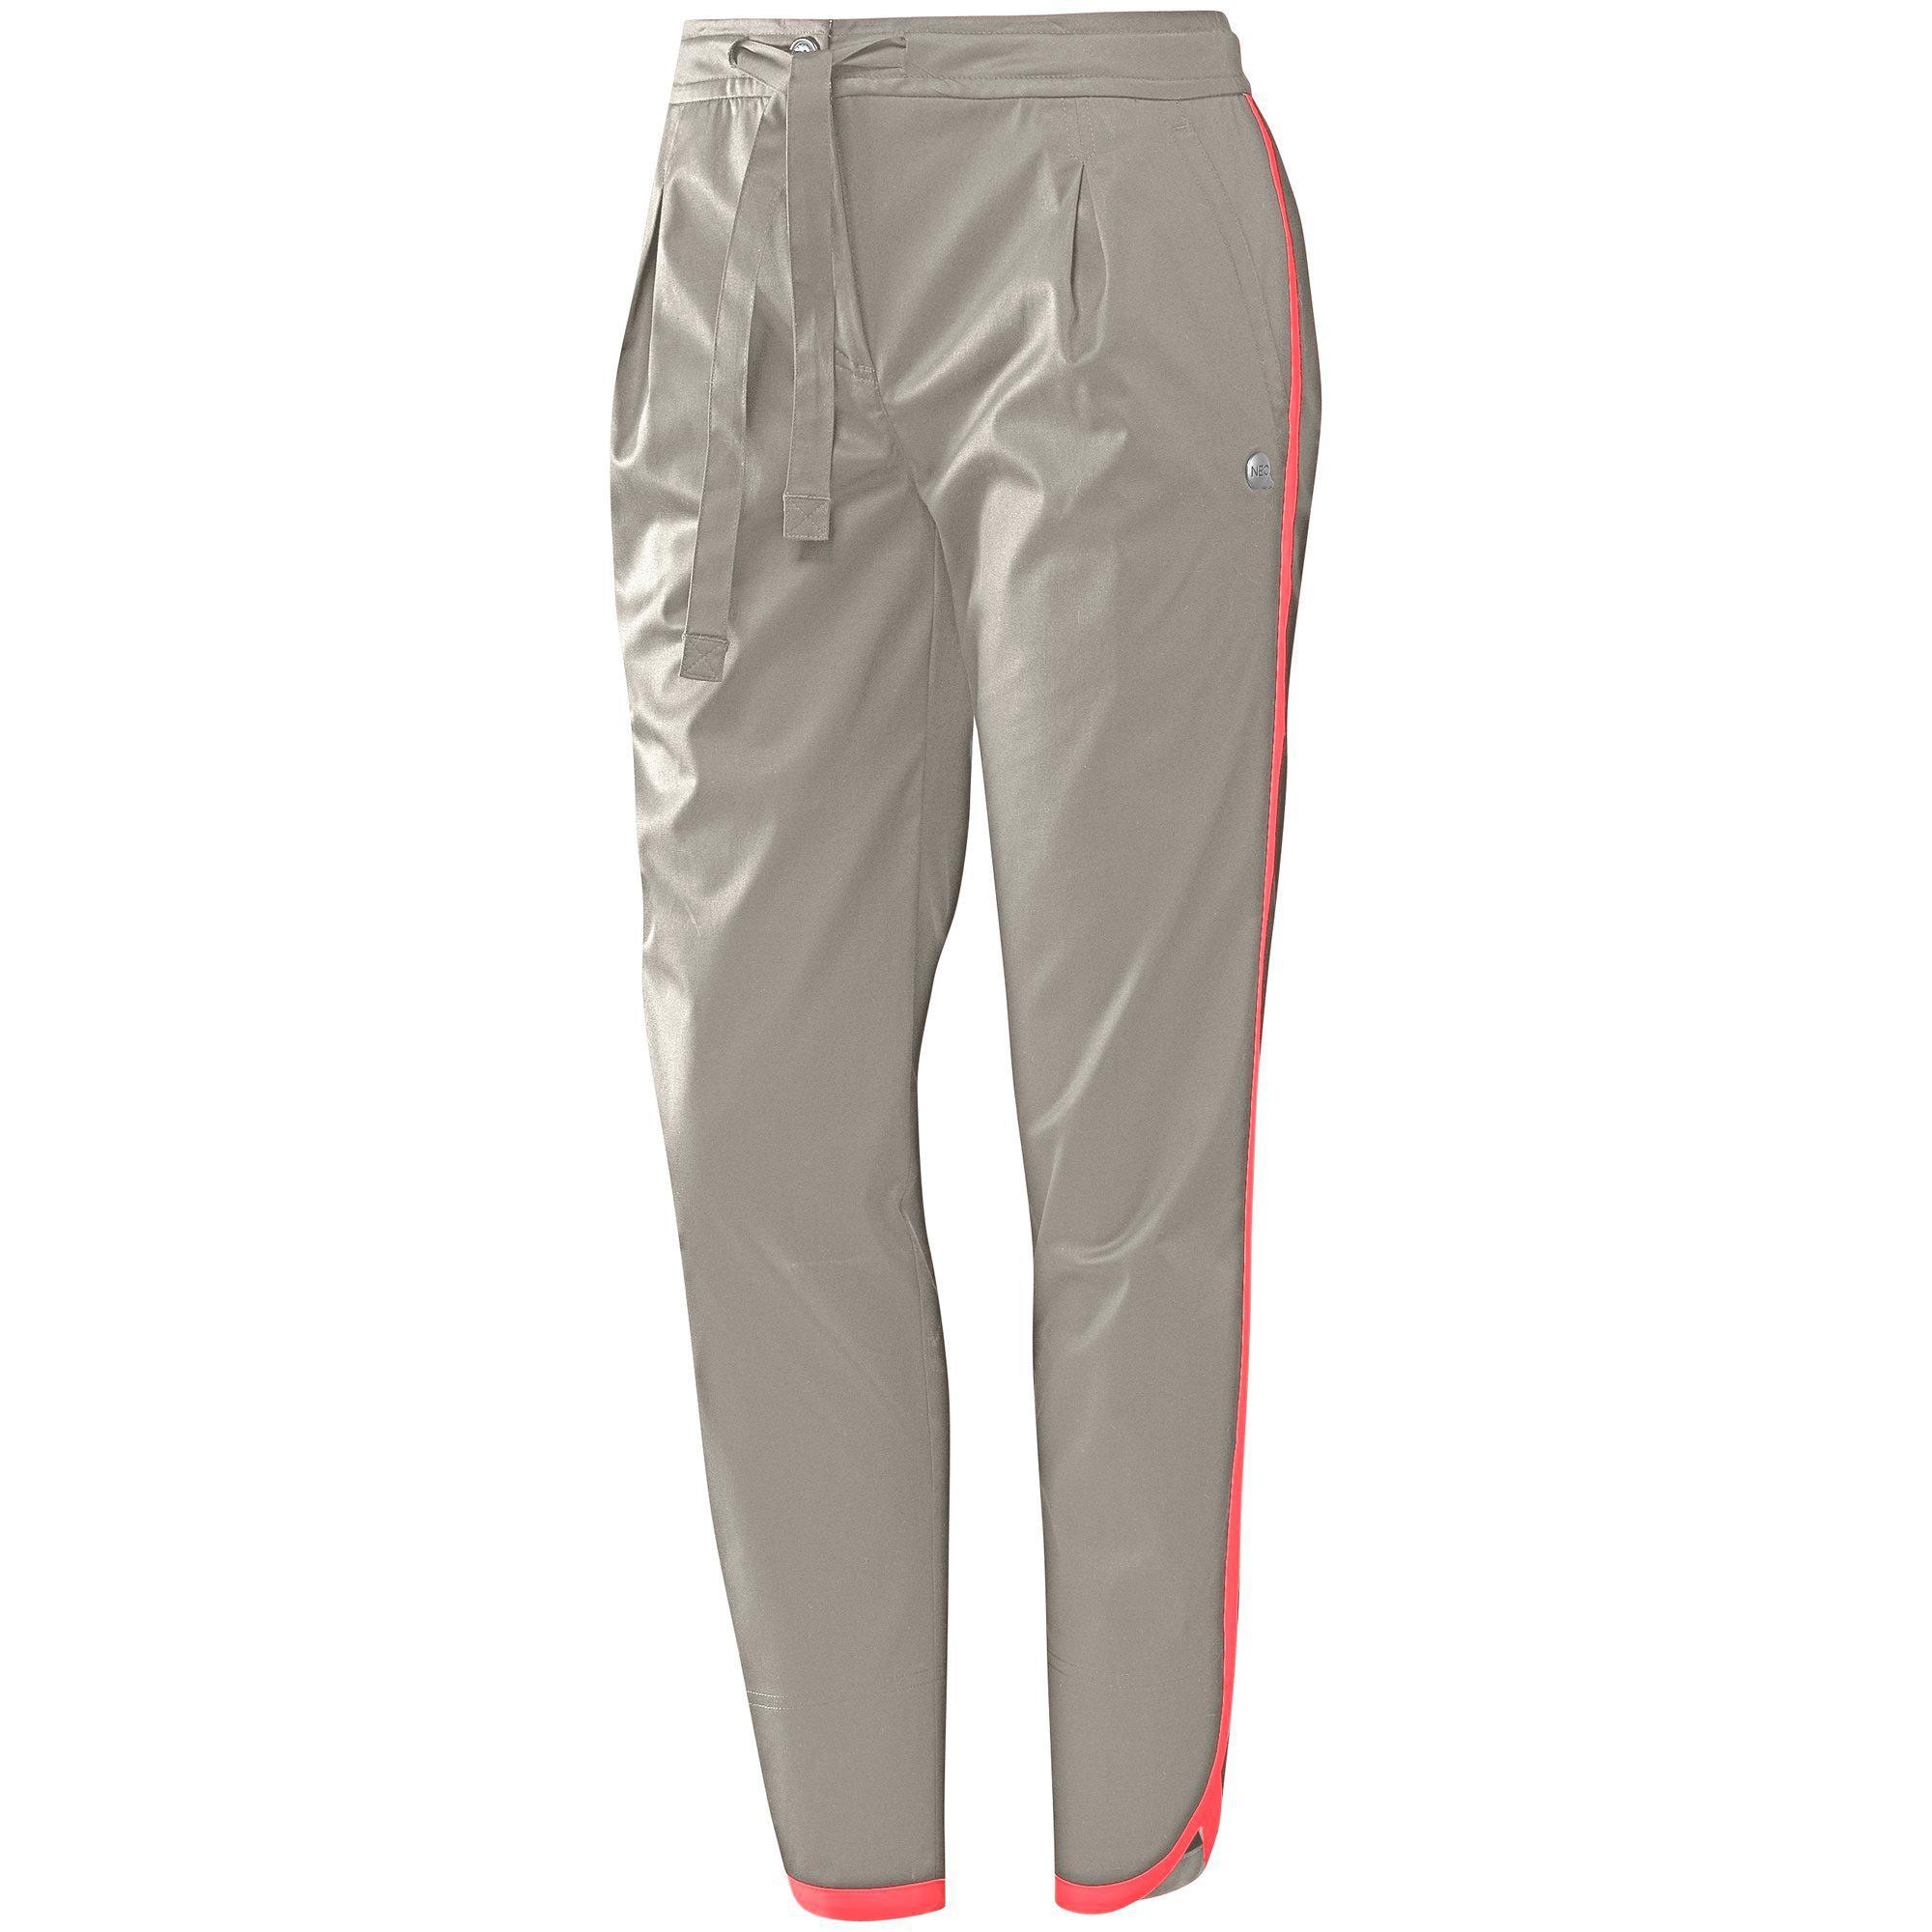 419527 Adidas Mujer 419527 Pantalón Foto Mujer Adidas Pantalón Foto mN80wn